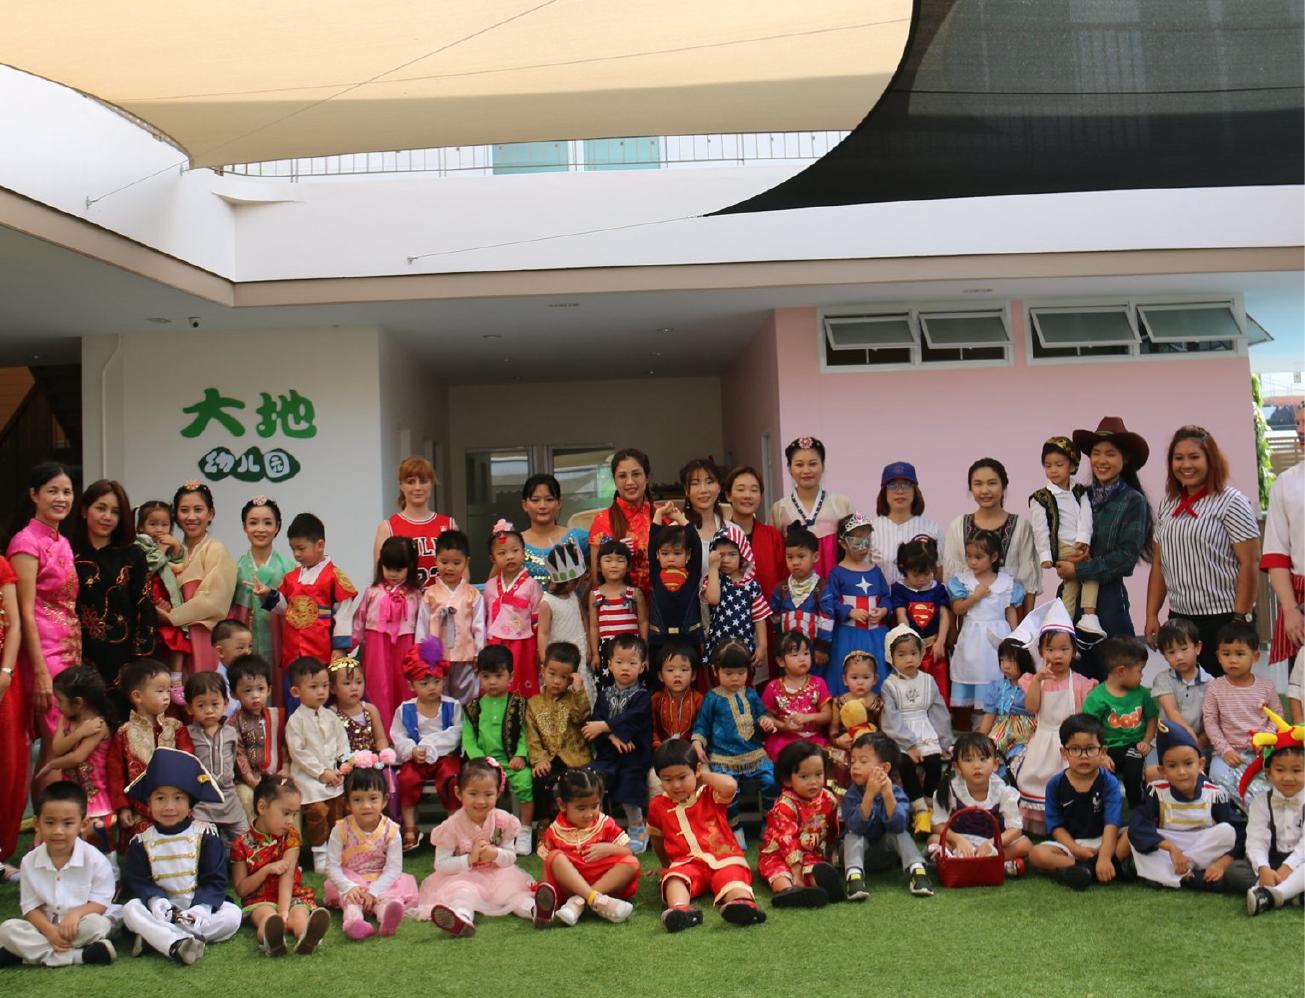 Dadi International Kindergarten is a joint venture between the China based Dadi Dadi International